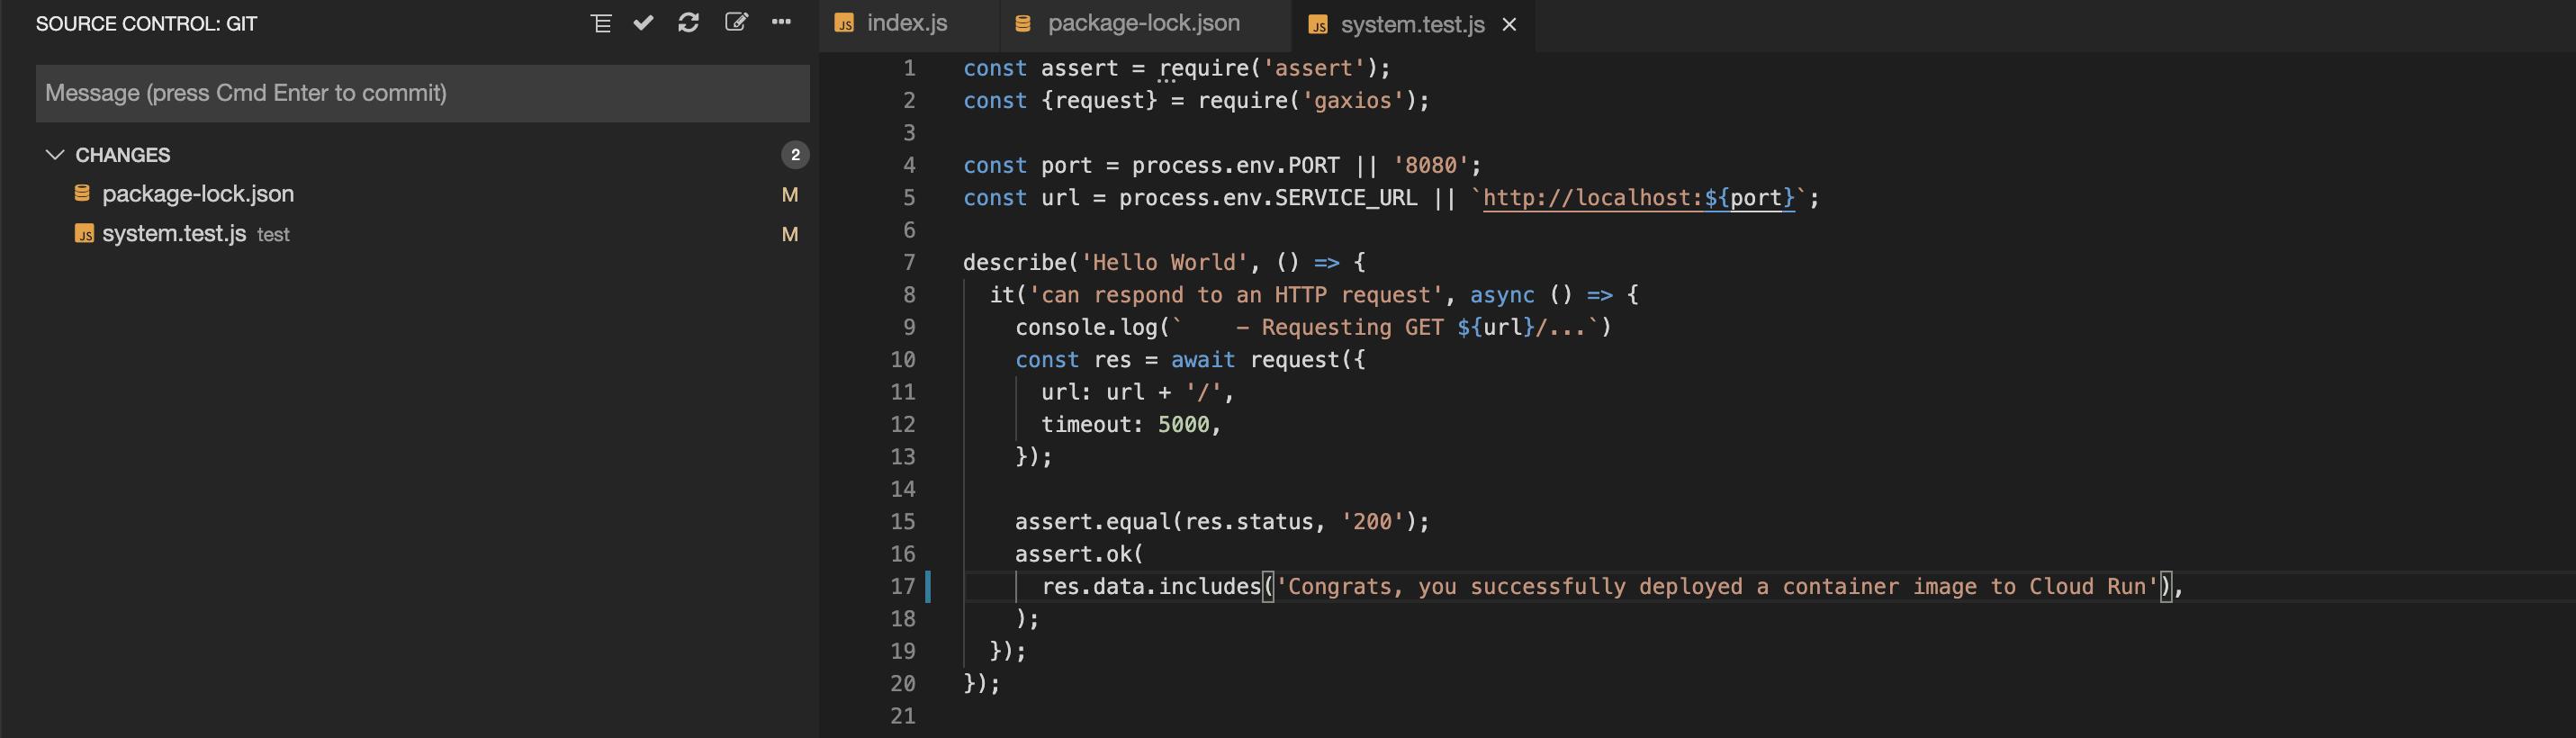 [Source Control: Git] の [Changes] セクションに表示される変更済みファイル